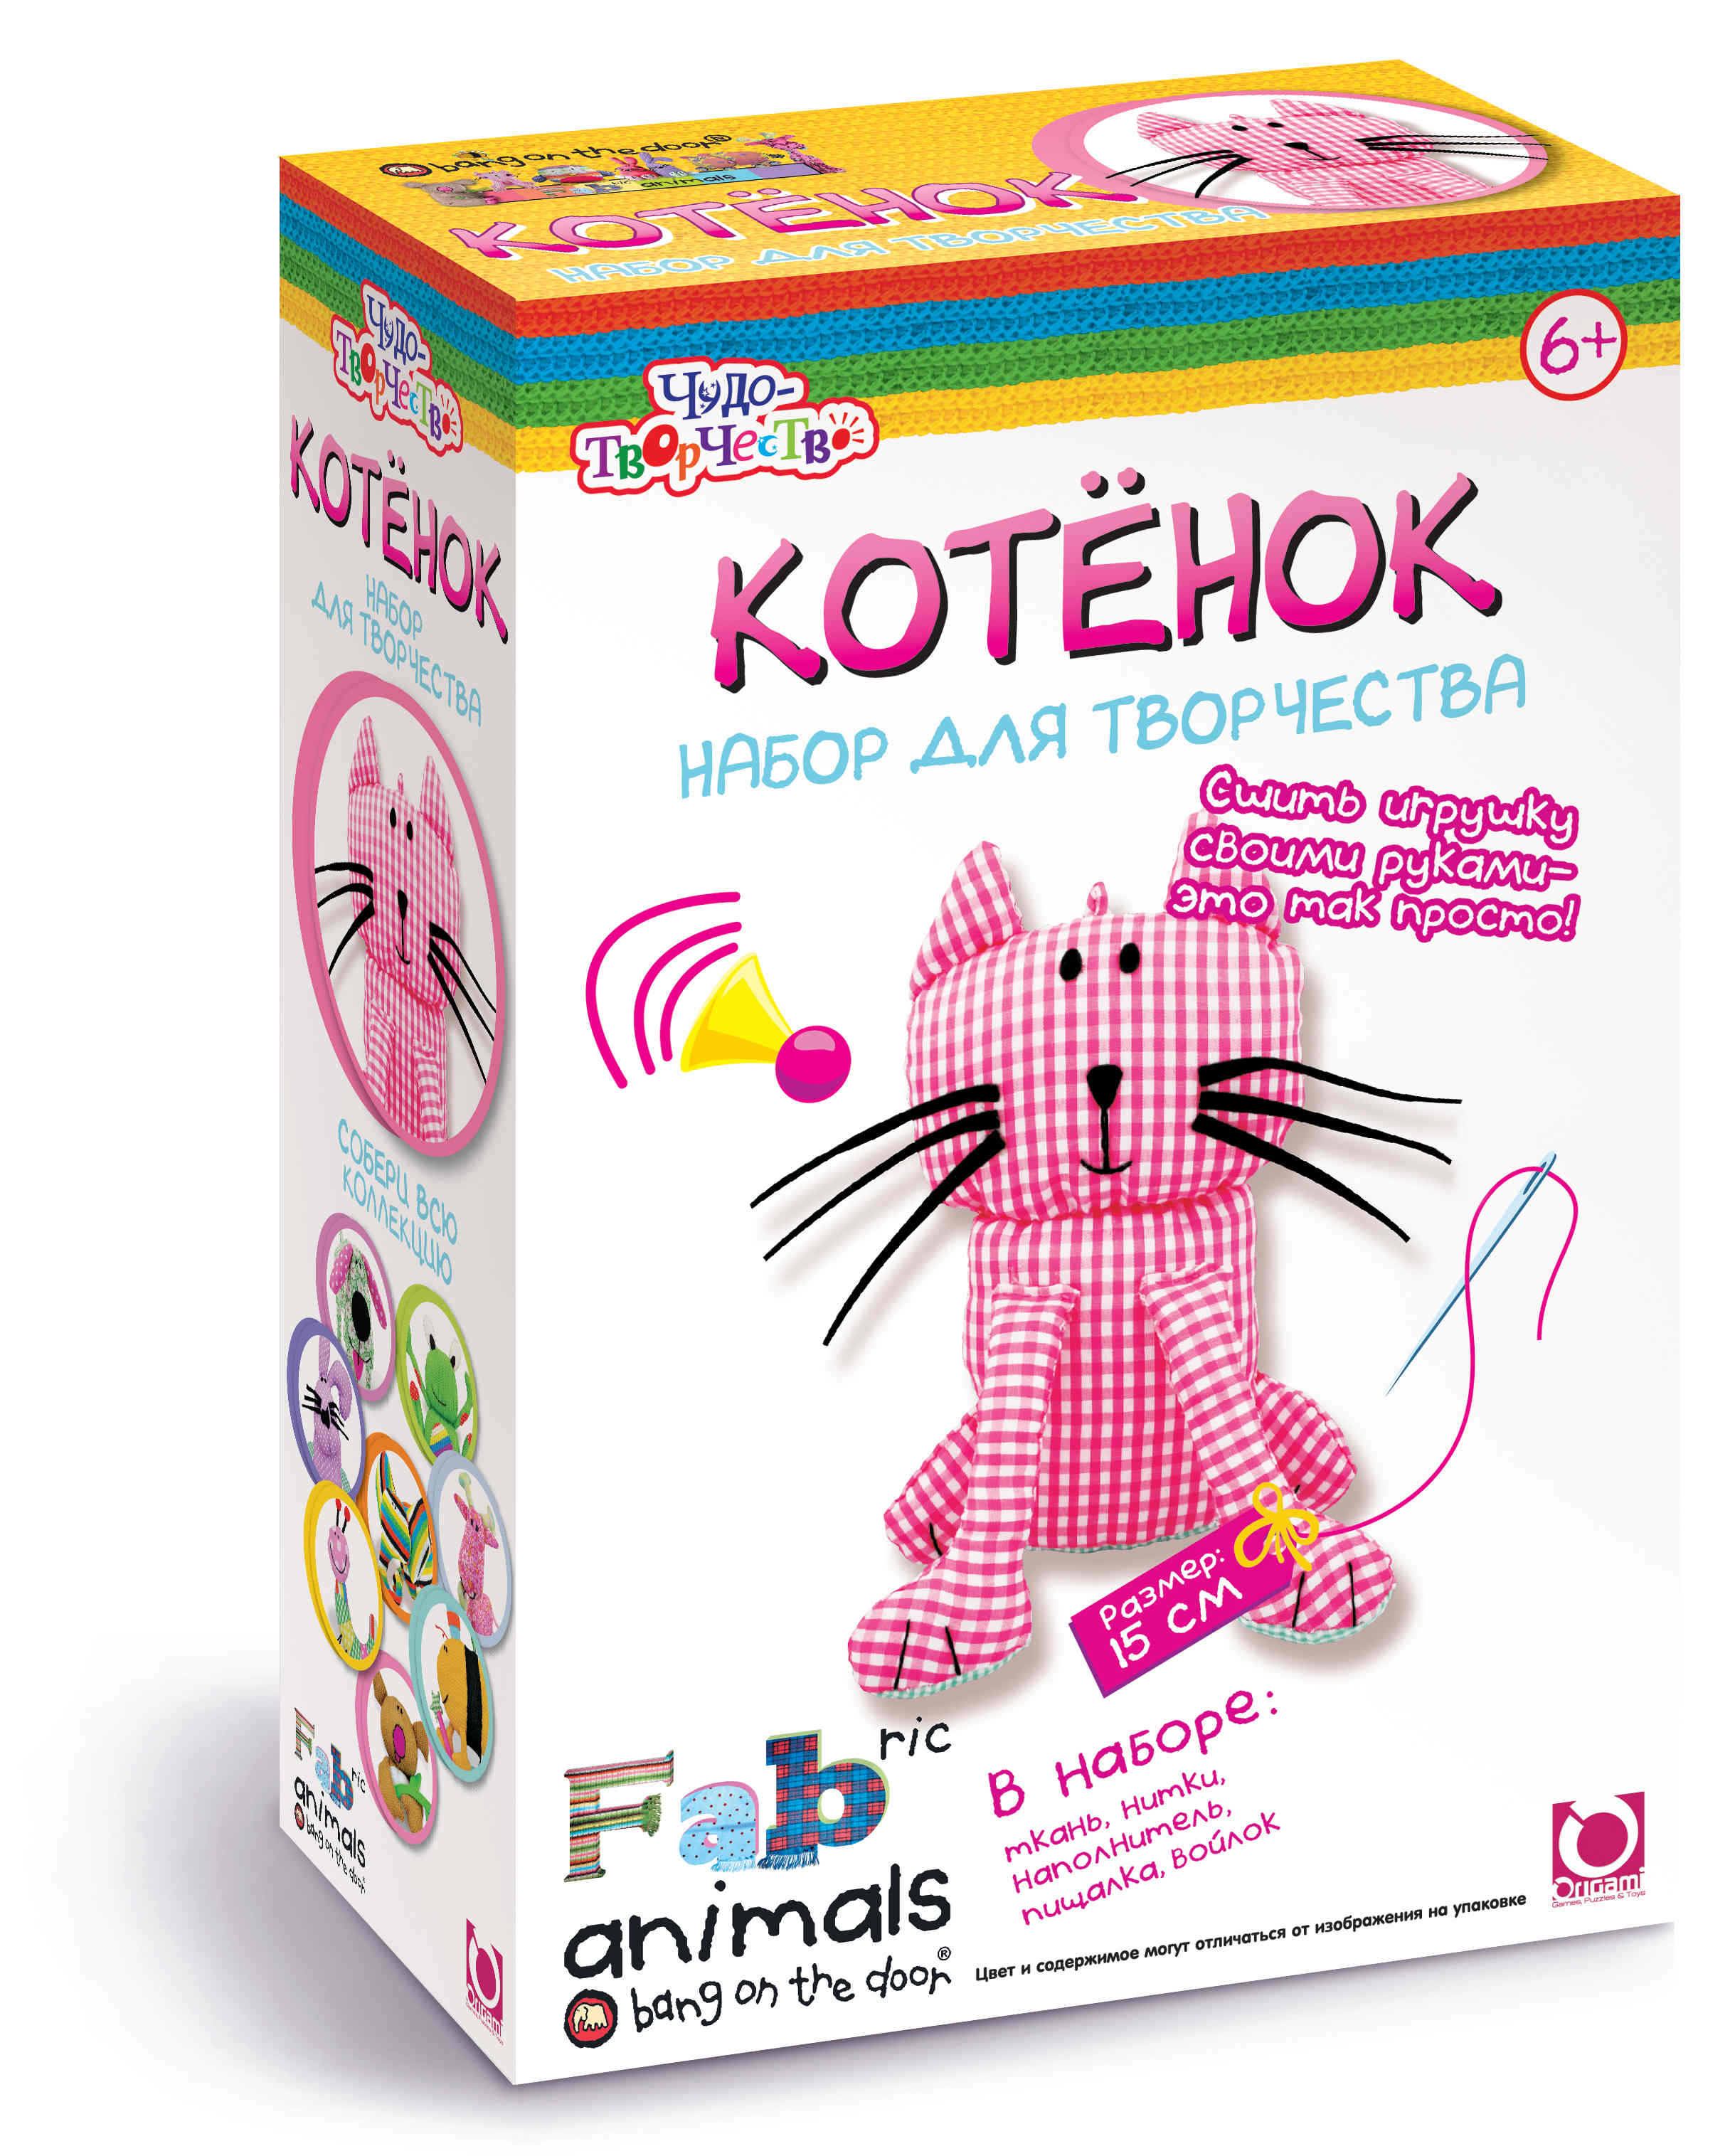 Чудо-Творчество. FABric animals. Сшей игрушку. Котёнок арт. 00783 набор д творчества чудо творчество fabric animals сшей игрушку жираф арт 00781